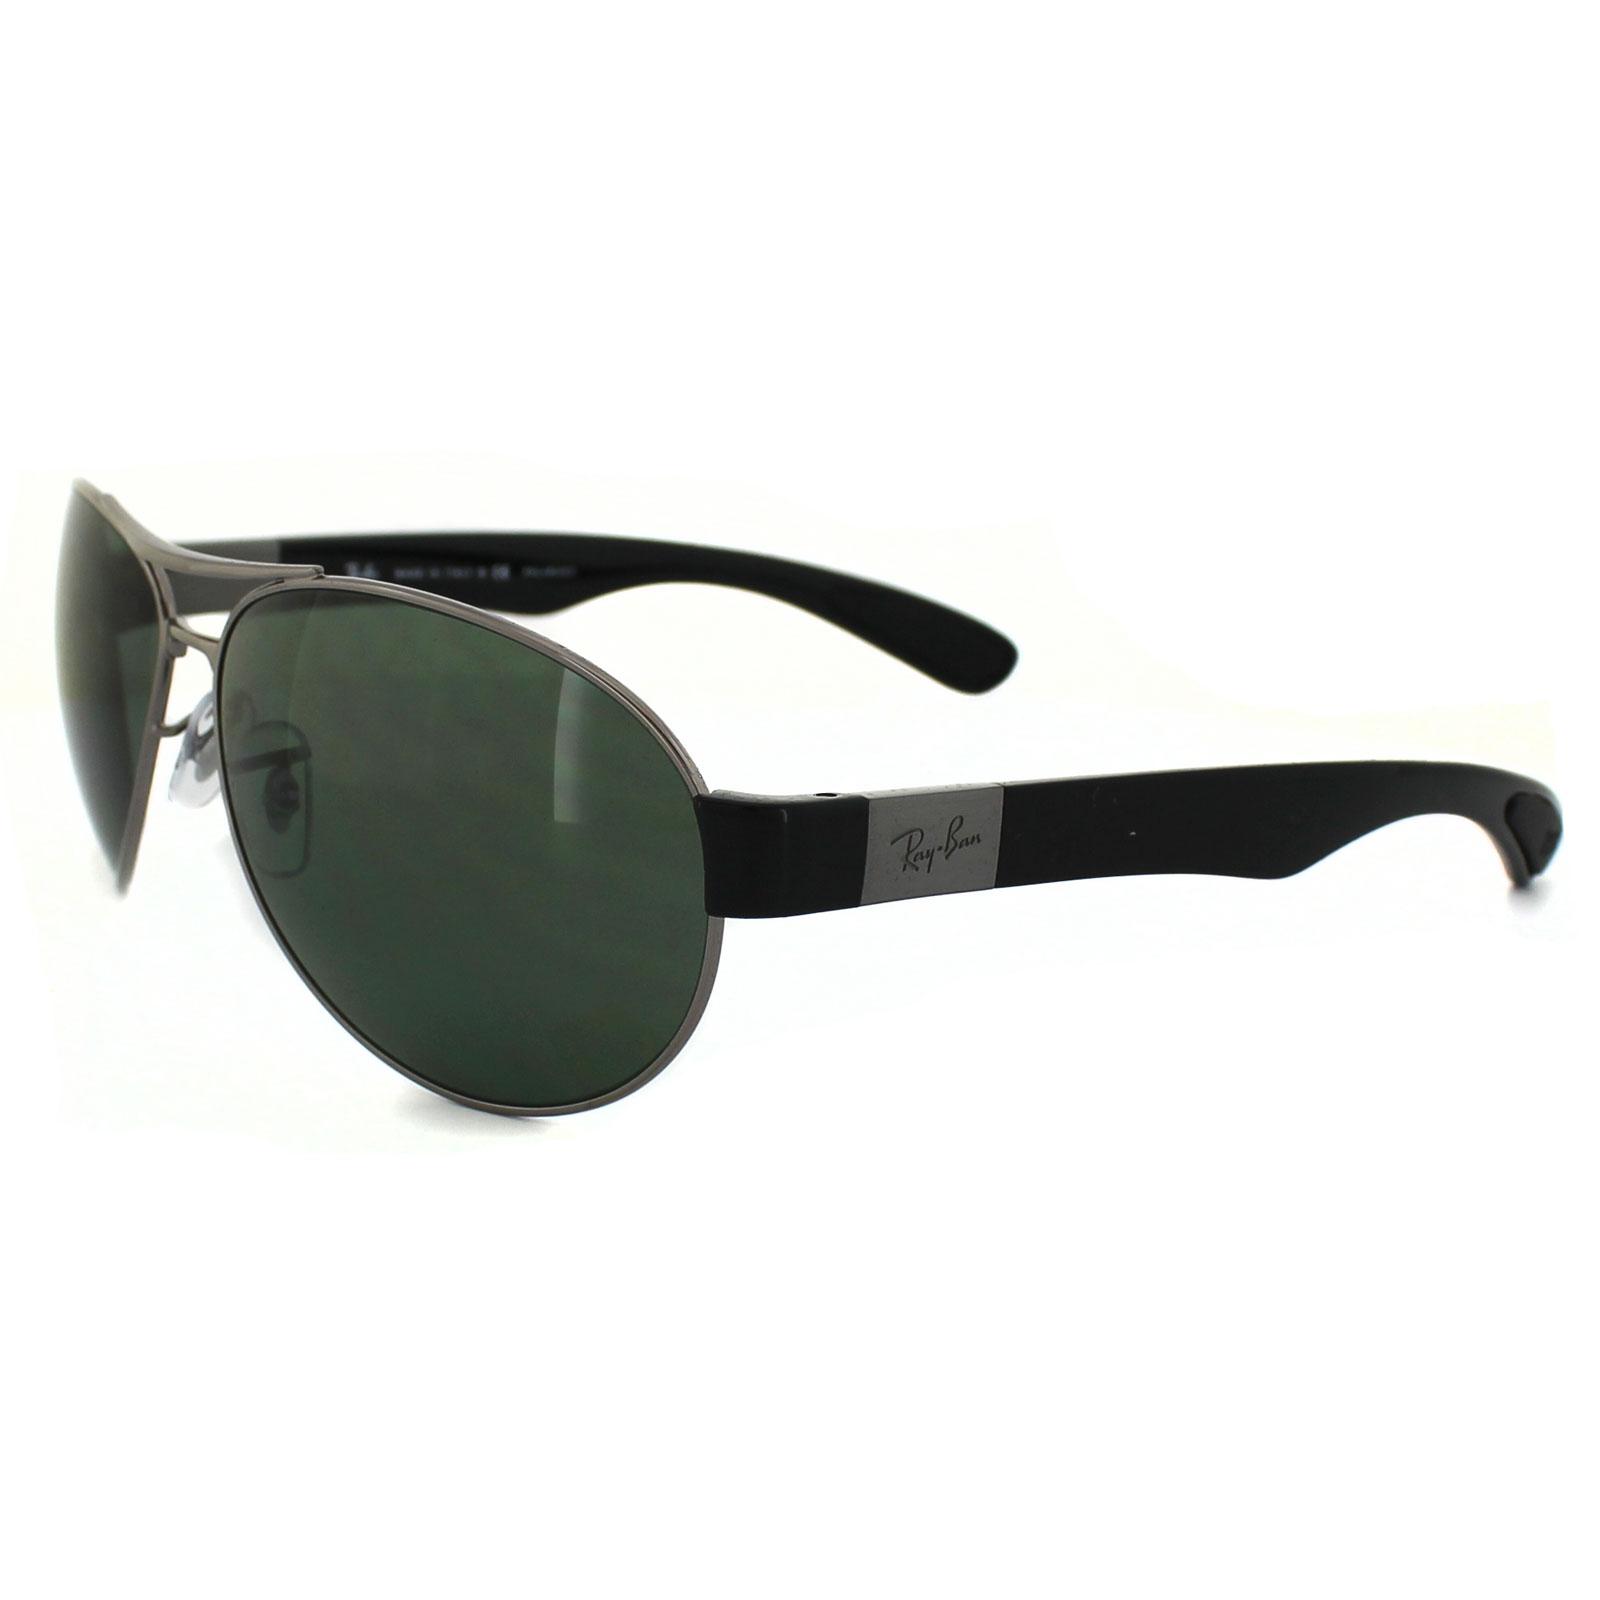 e93cce67ee Sentinel Ray-Ban Sunglasses 3509 004 9A Gunmetal Green Polarized